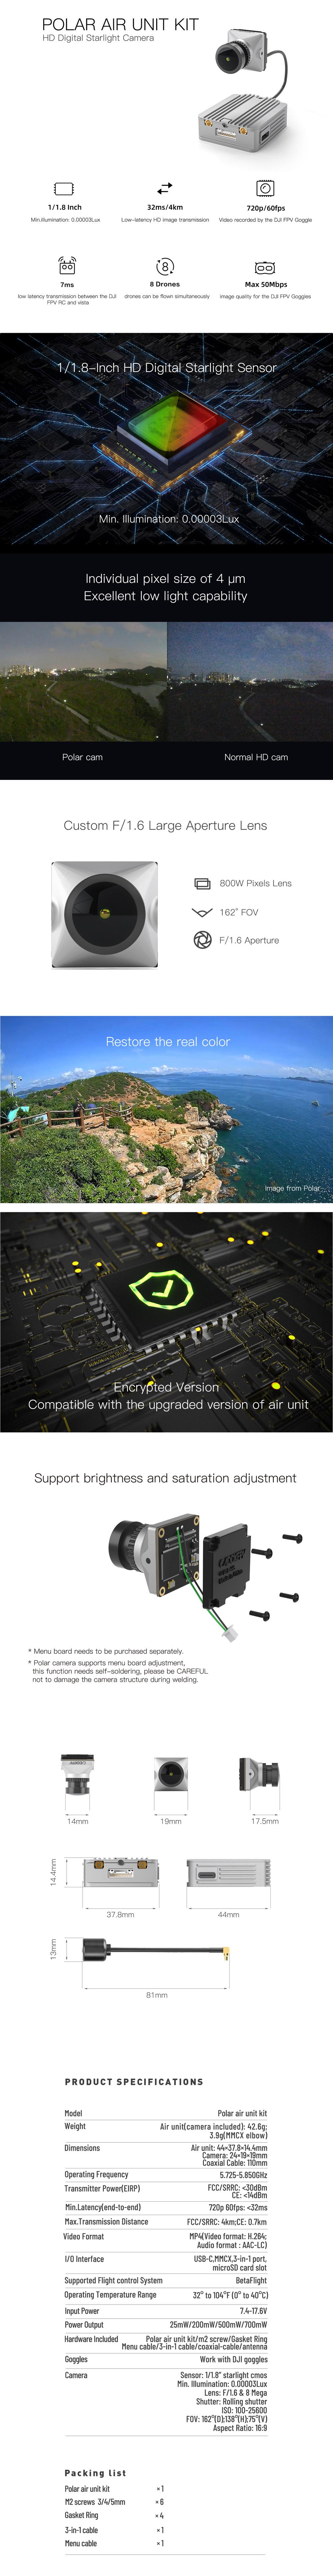 Caddx-Polar-Micro-Digital-FPV-Air-Unit-Camera-Kit-Infographic.jpg